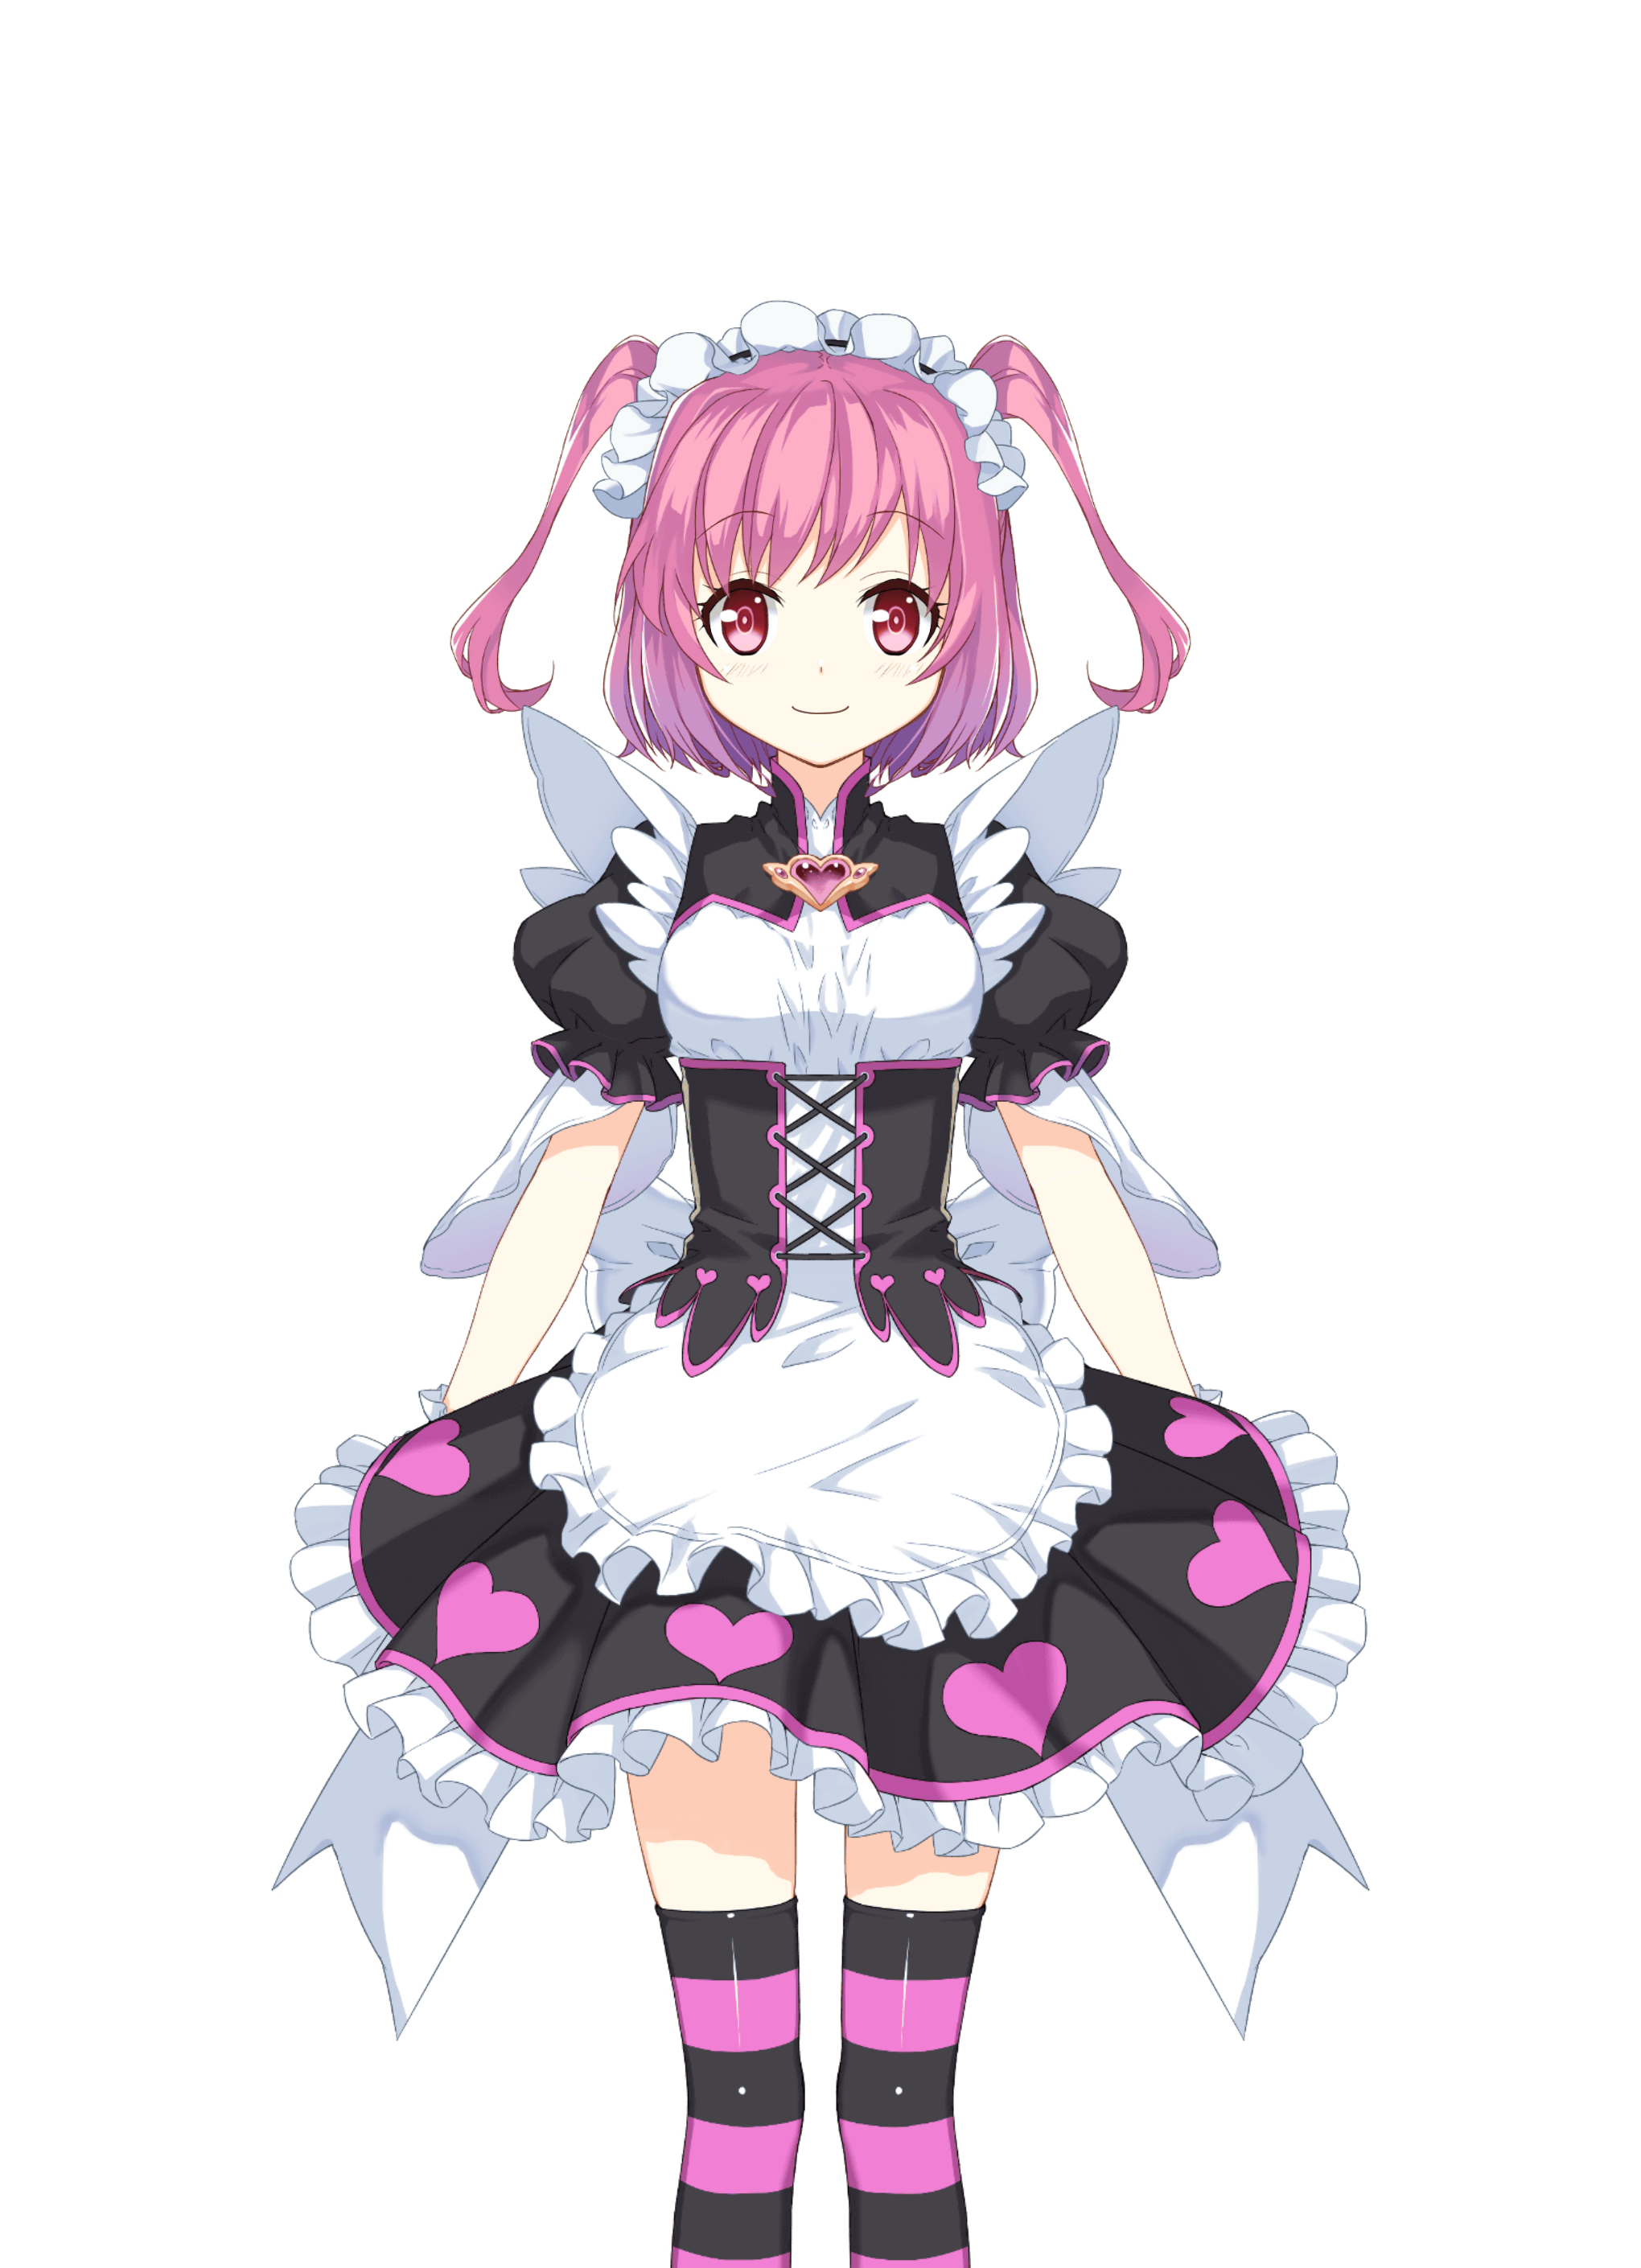 Makino Ikumi/Costumes | Magia Record English Wiki | FANDOM powered